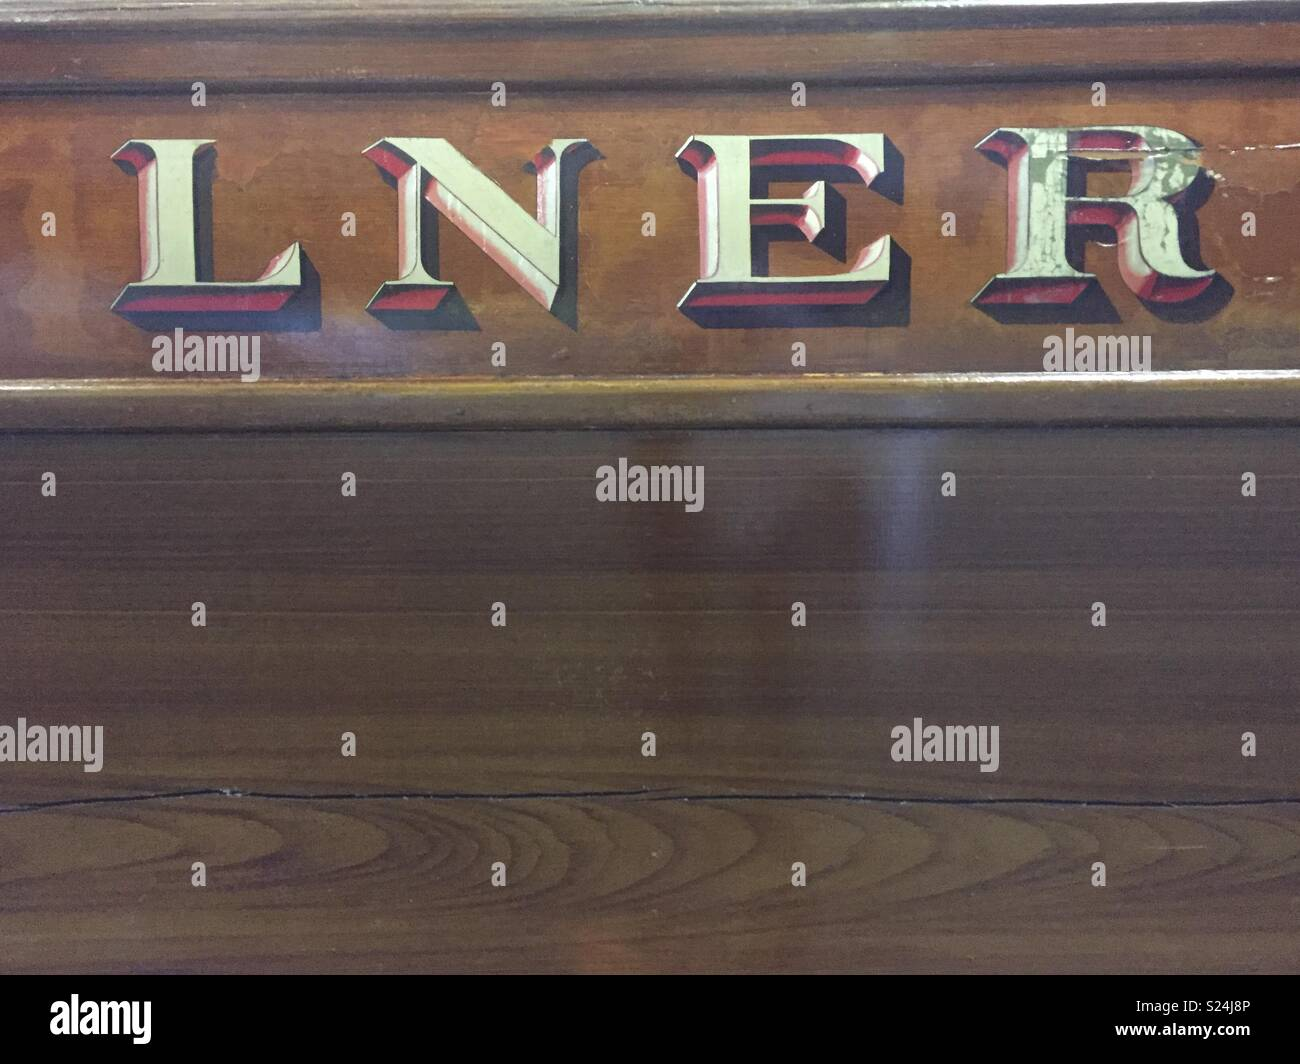 LNER - Stock Image